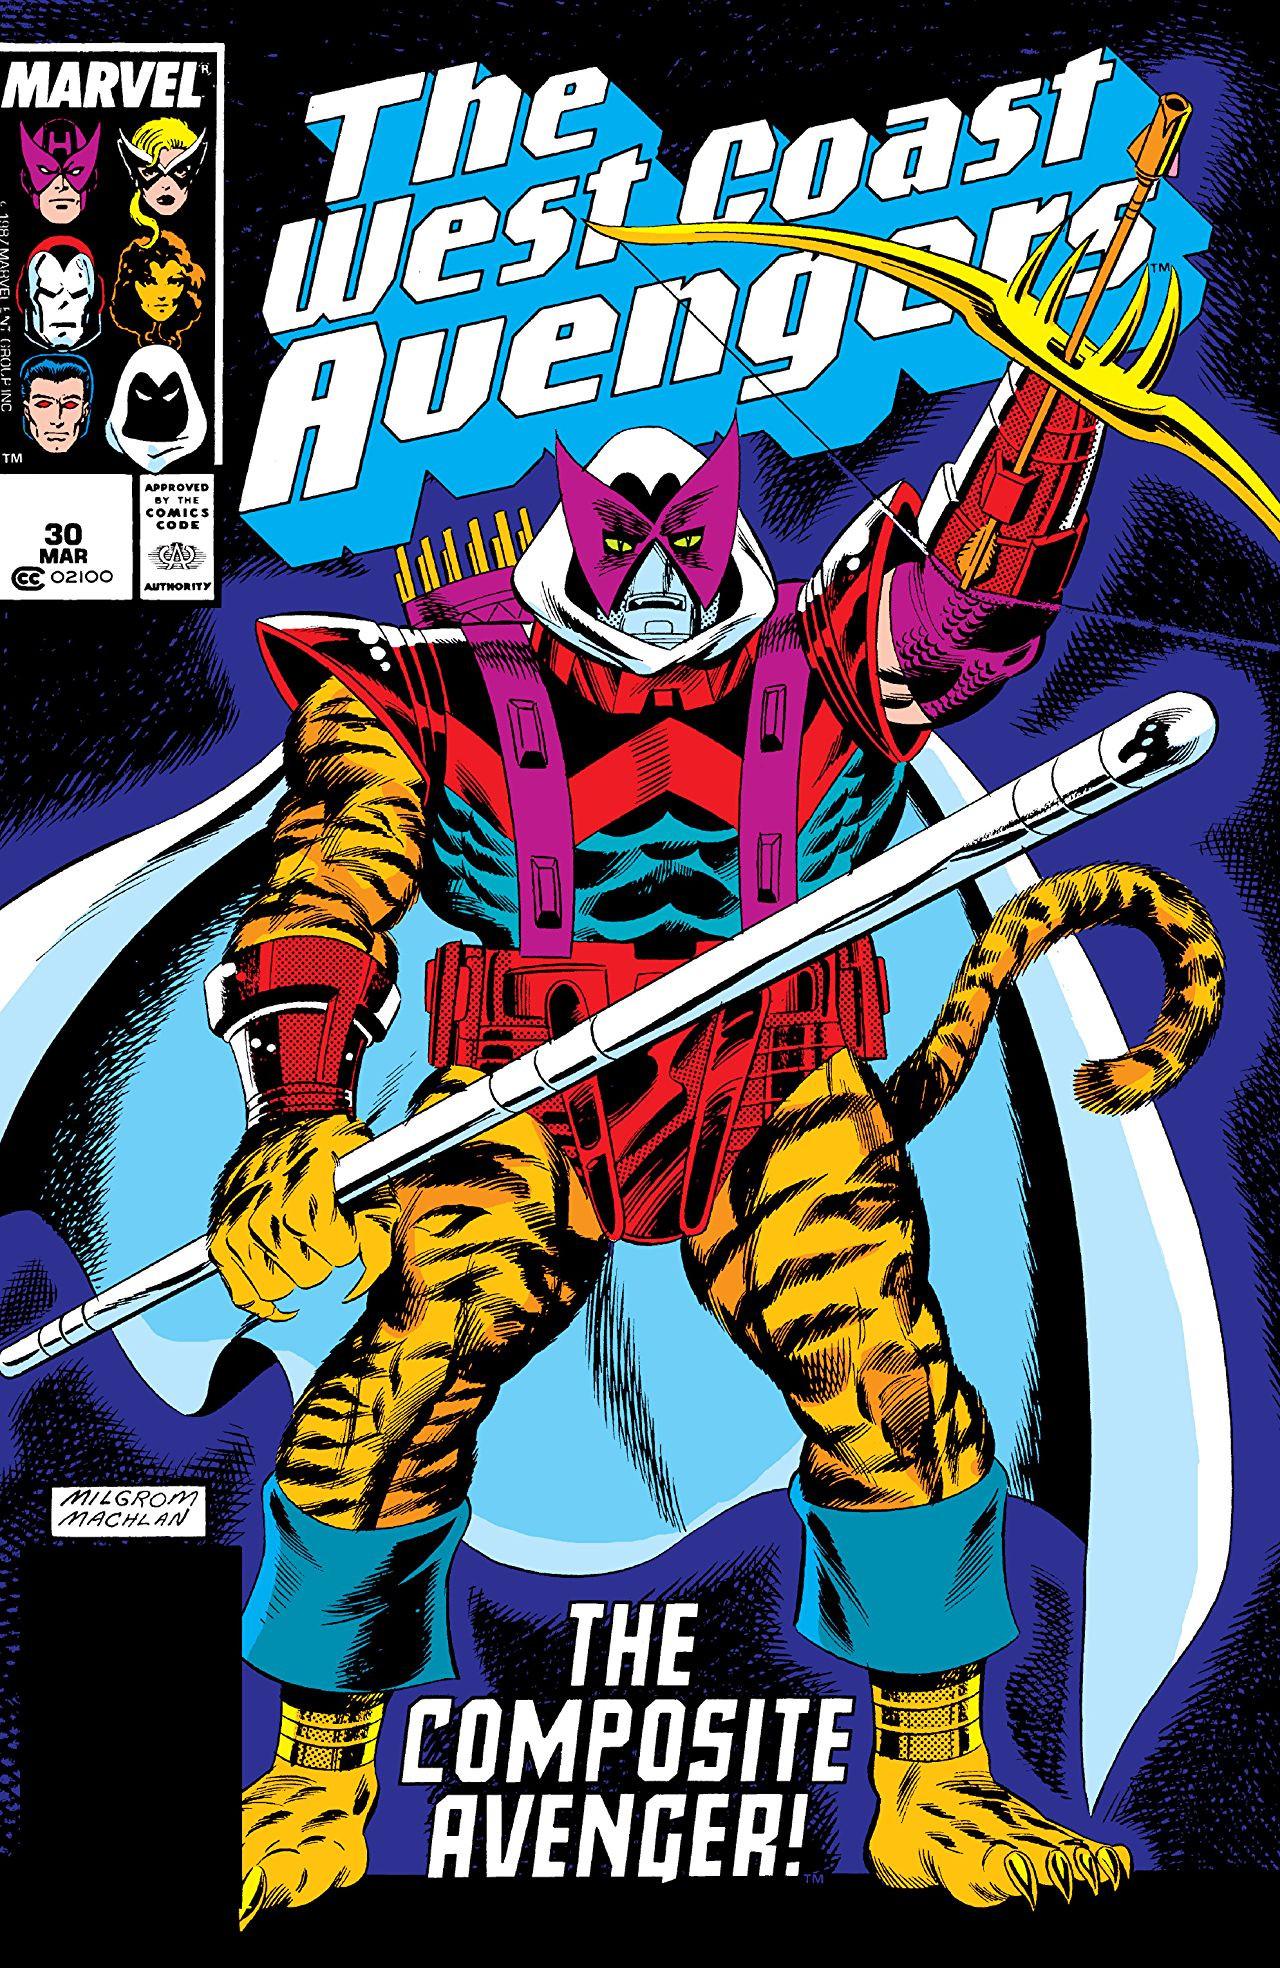 West Coast Avengers vol. 1 #30